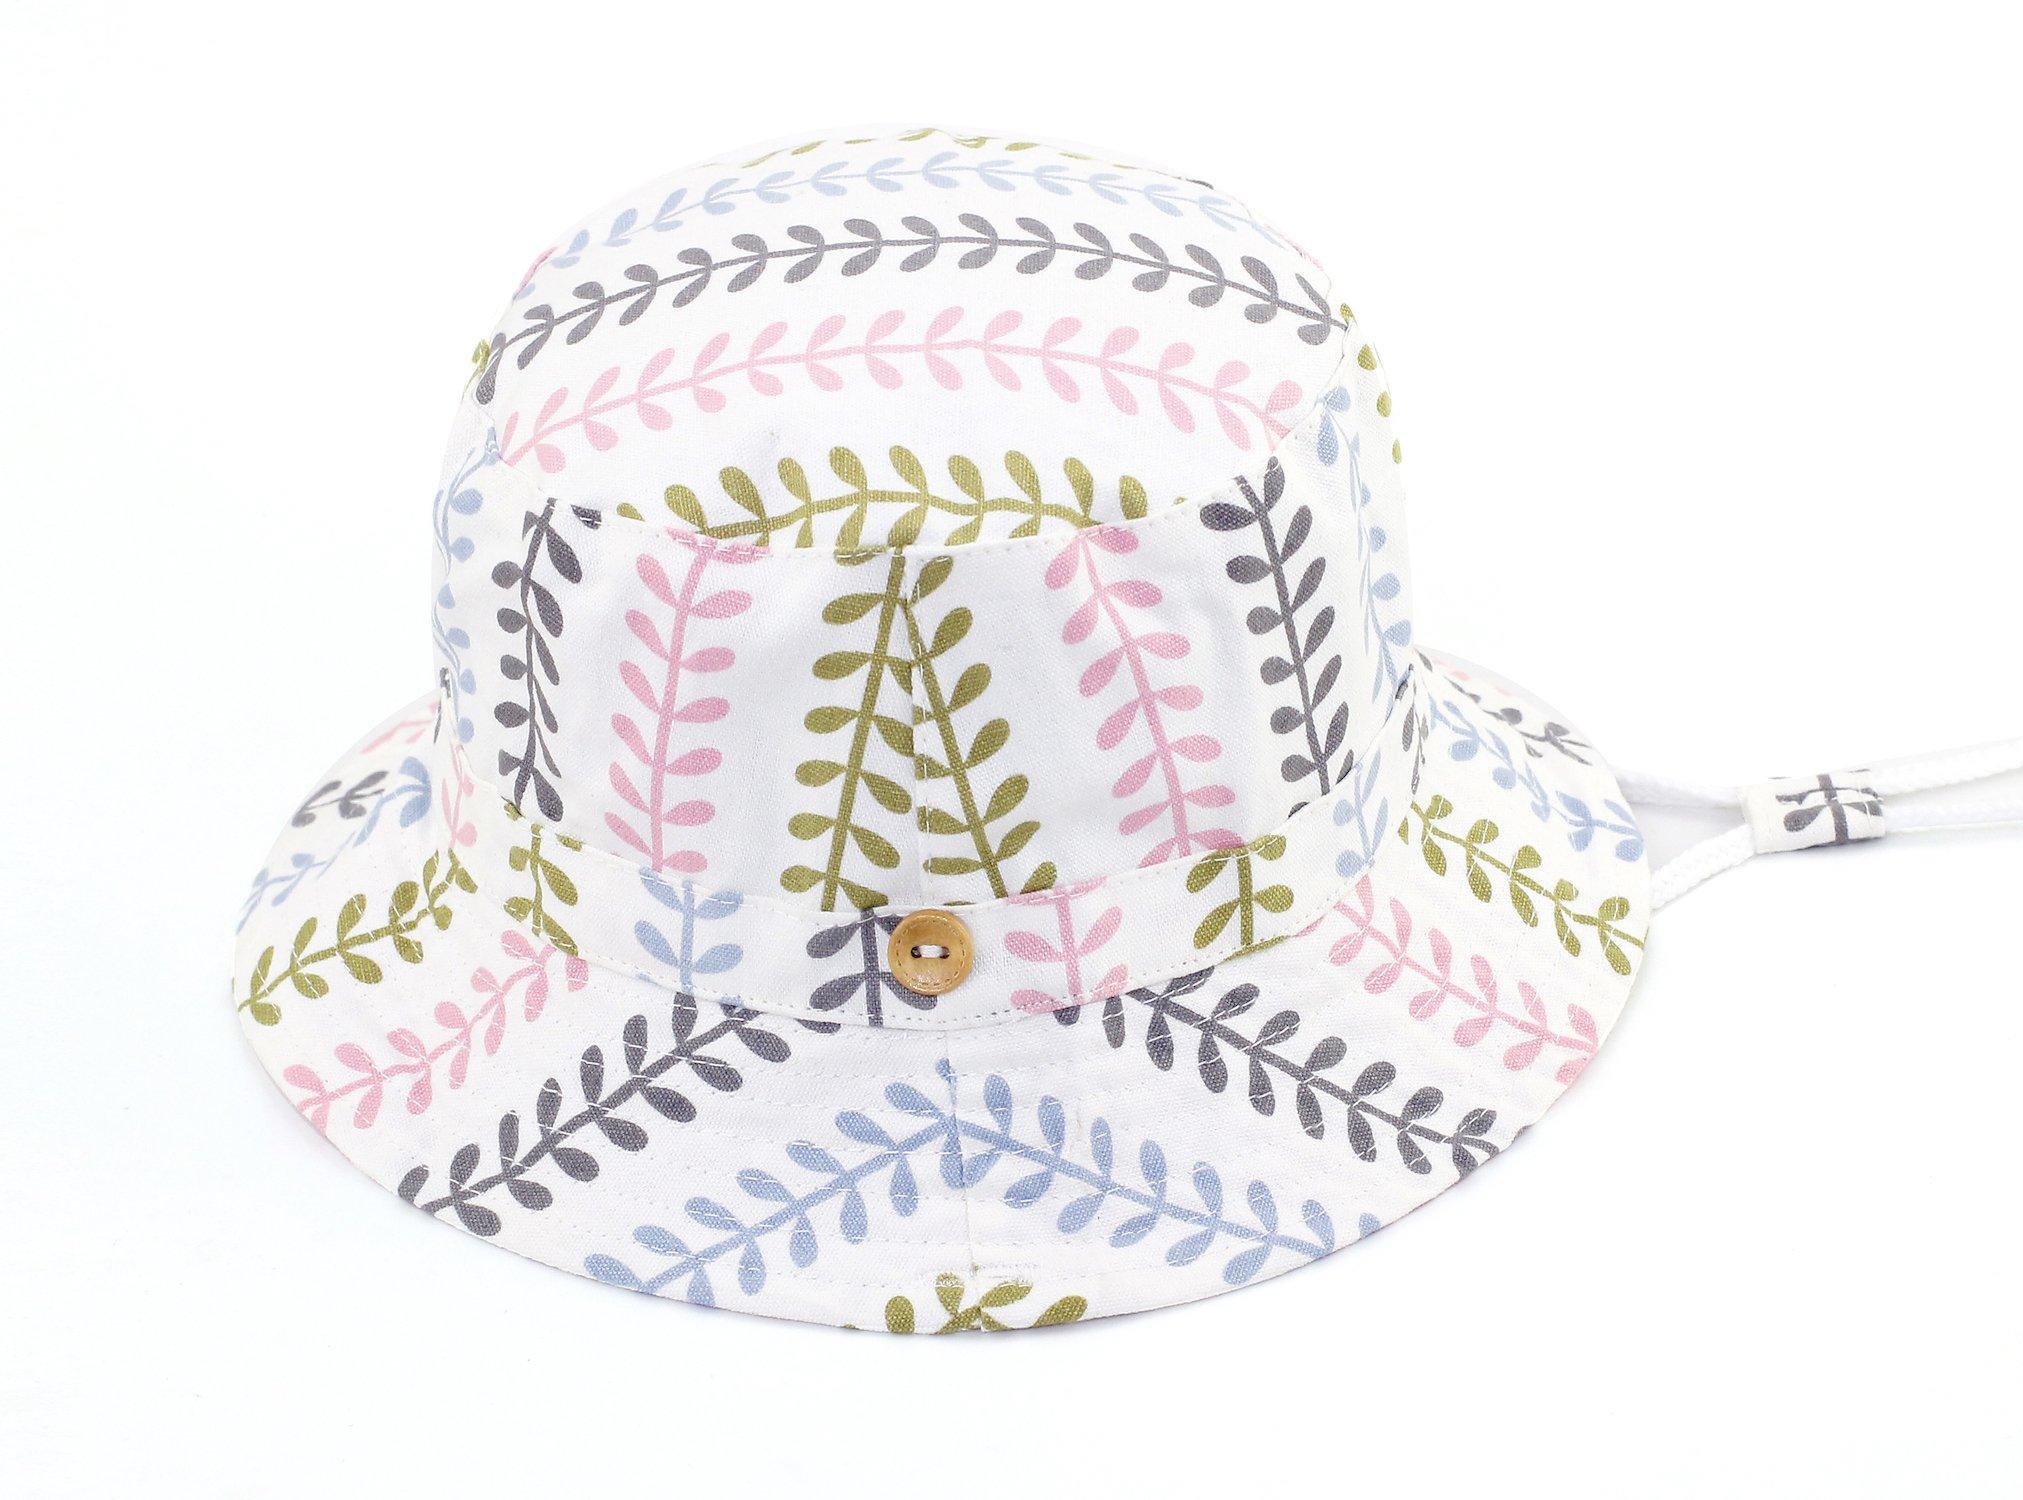 Home Prefer Toddler Kids UPF 50+ Bucket Sun Hat Summer Outdoor Sun Protection Hat for Girls #50